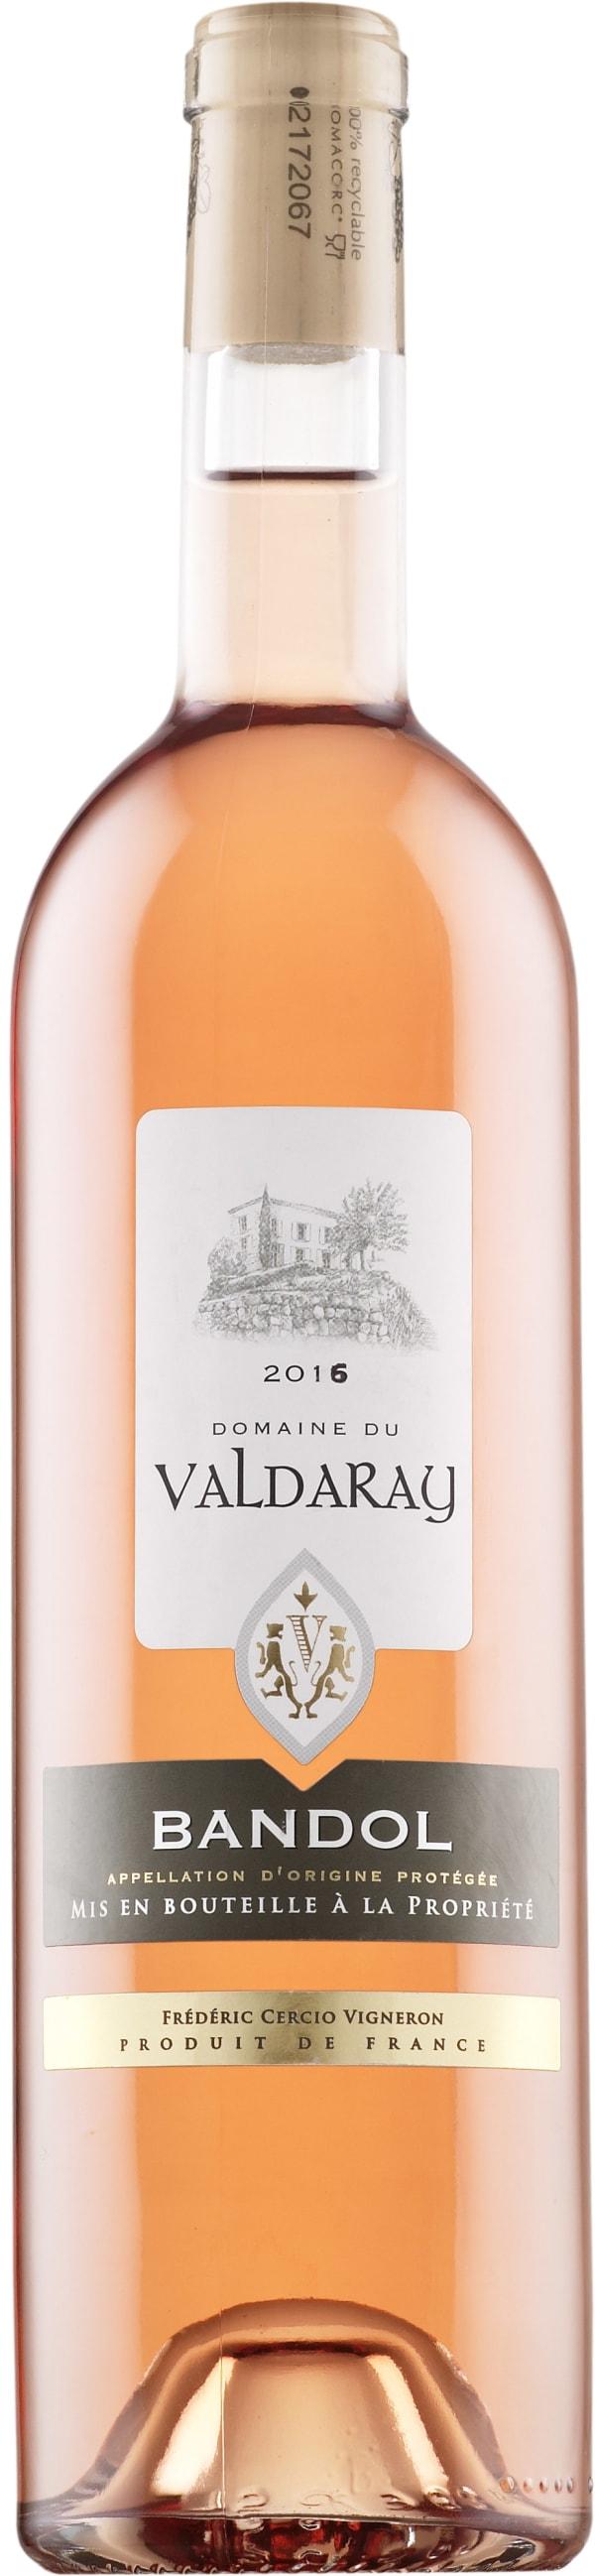 Domaine du Valdaray 2016